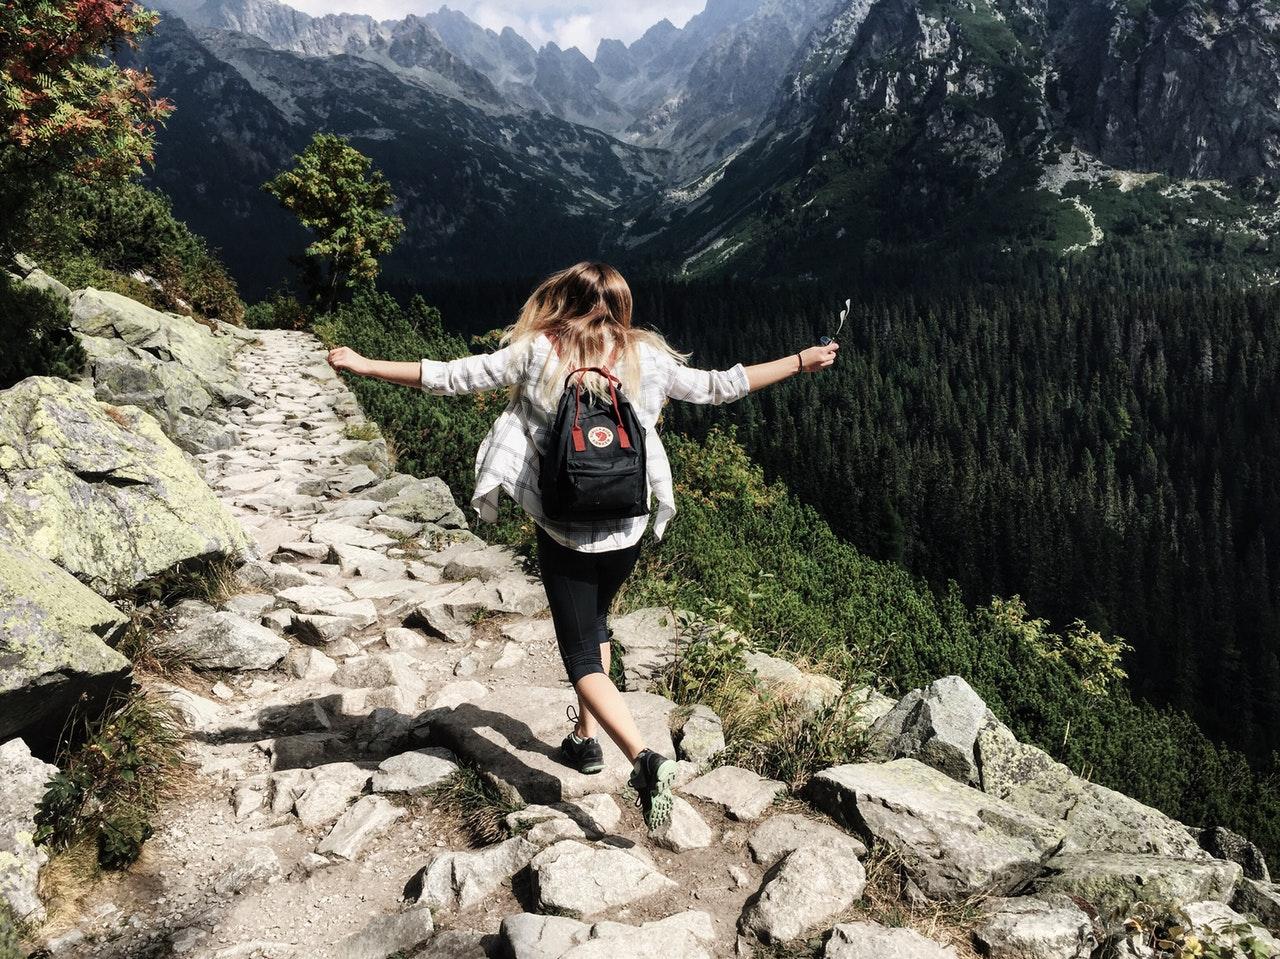 Hiking-04-Pivotal-Health.jpeg